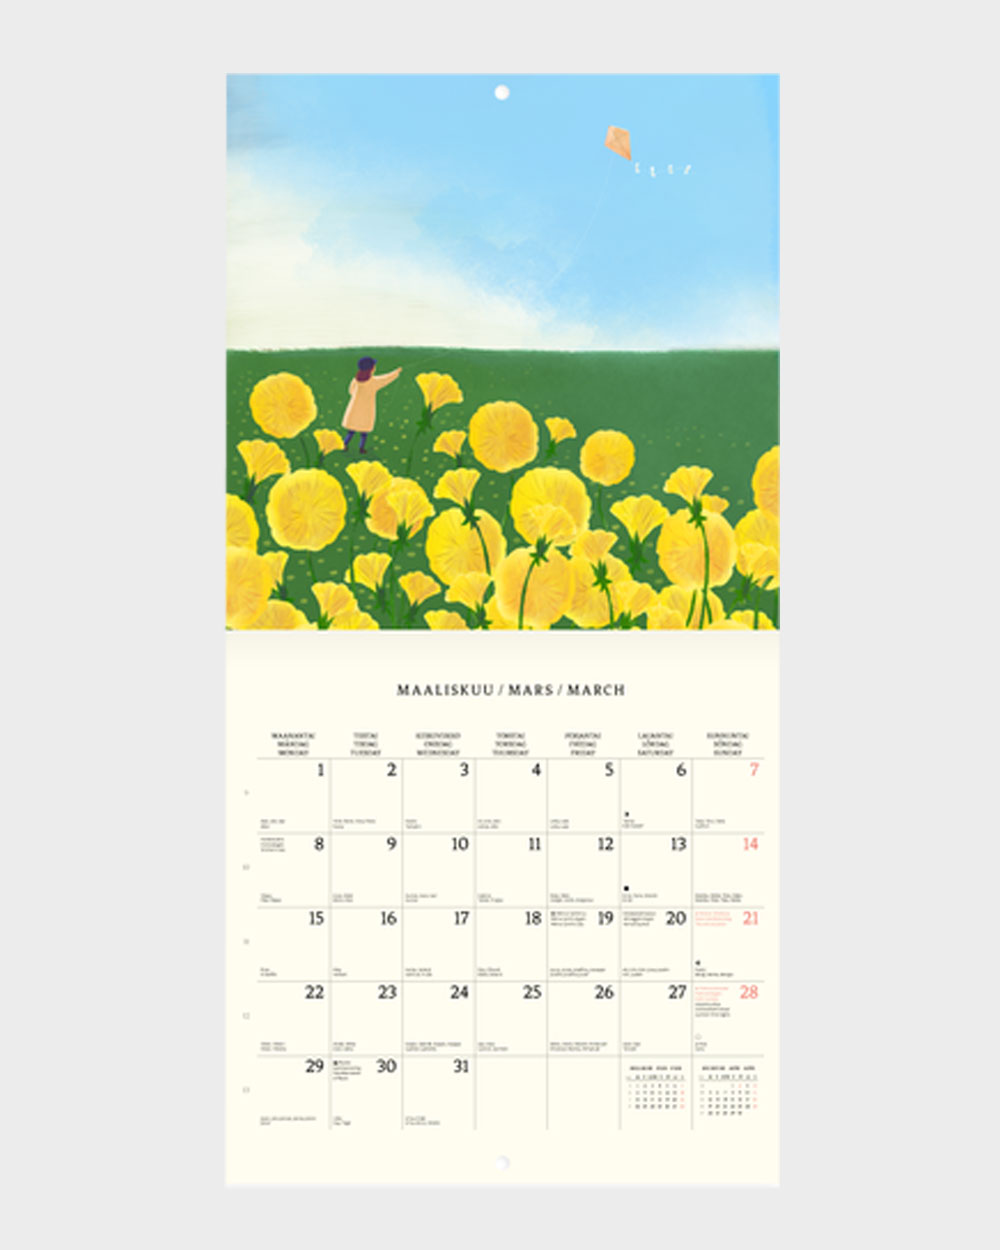 Polka Paper seinäkalenteri 2022 maaliskuu